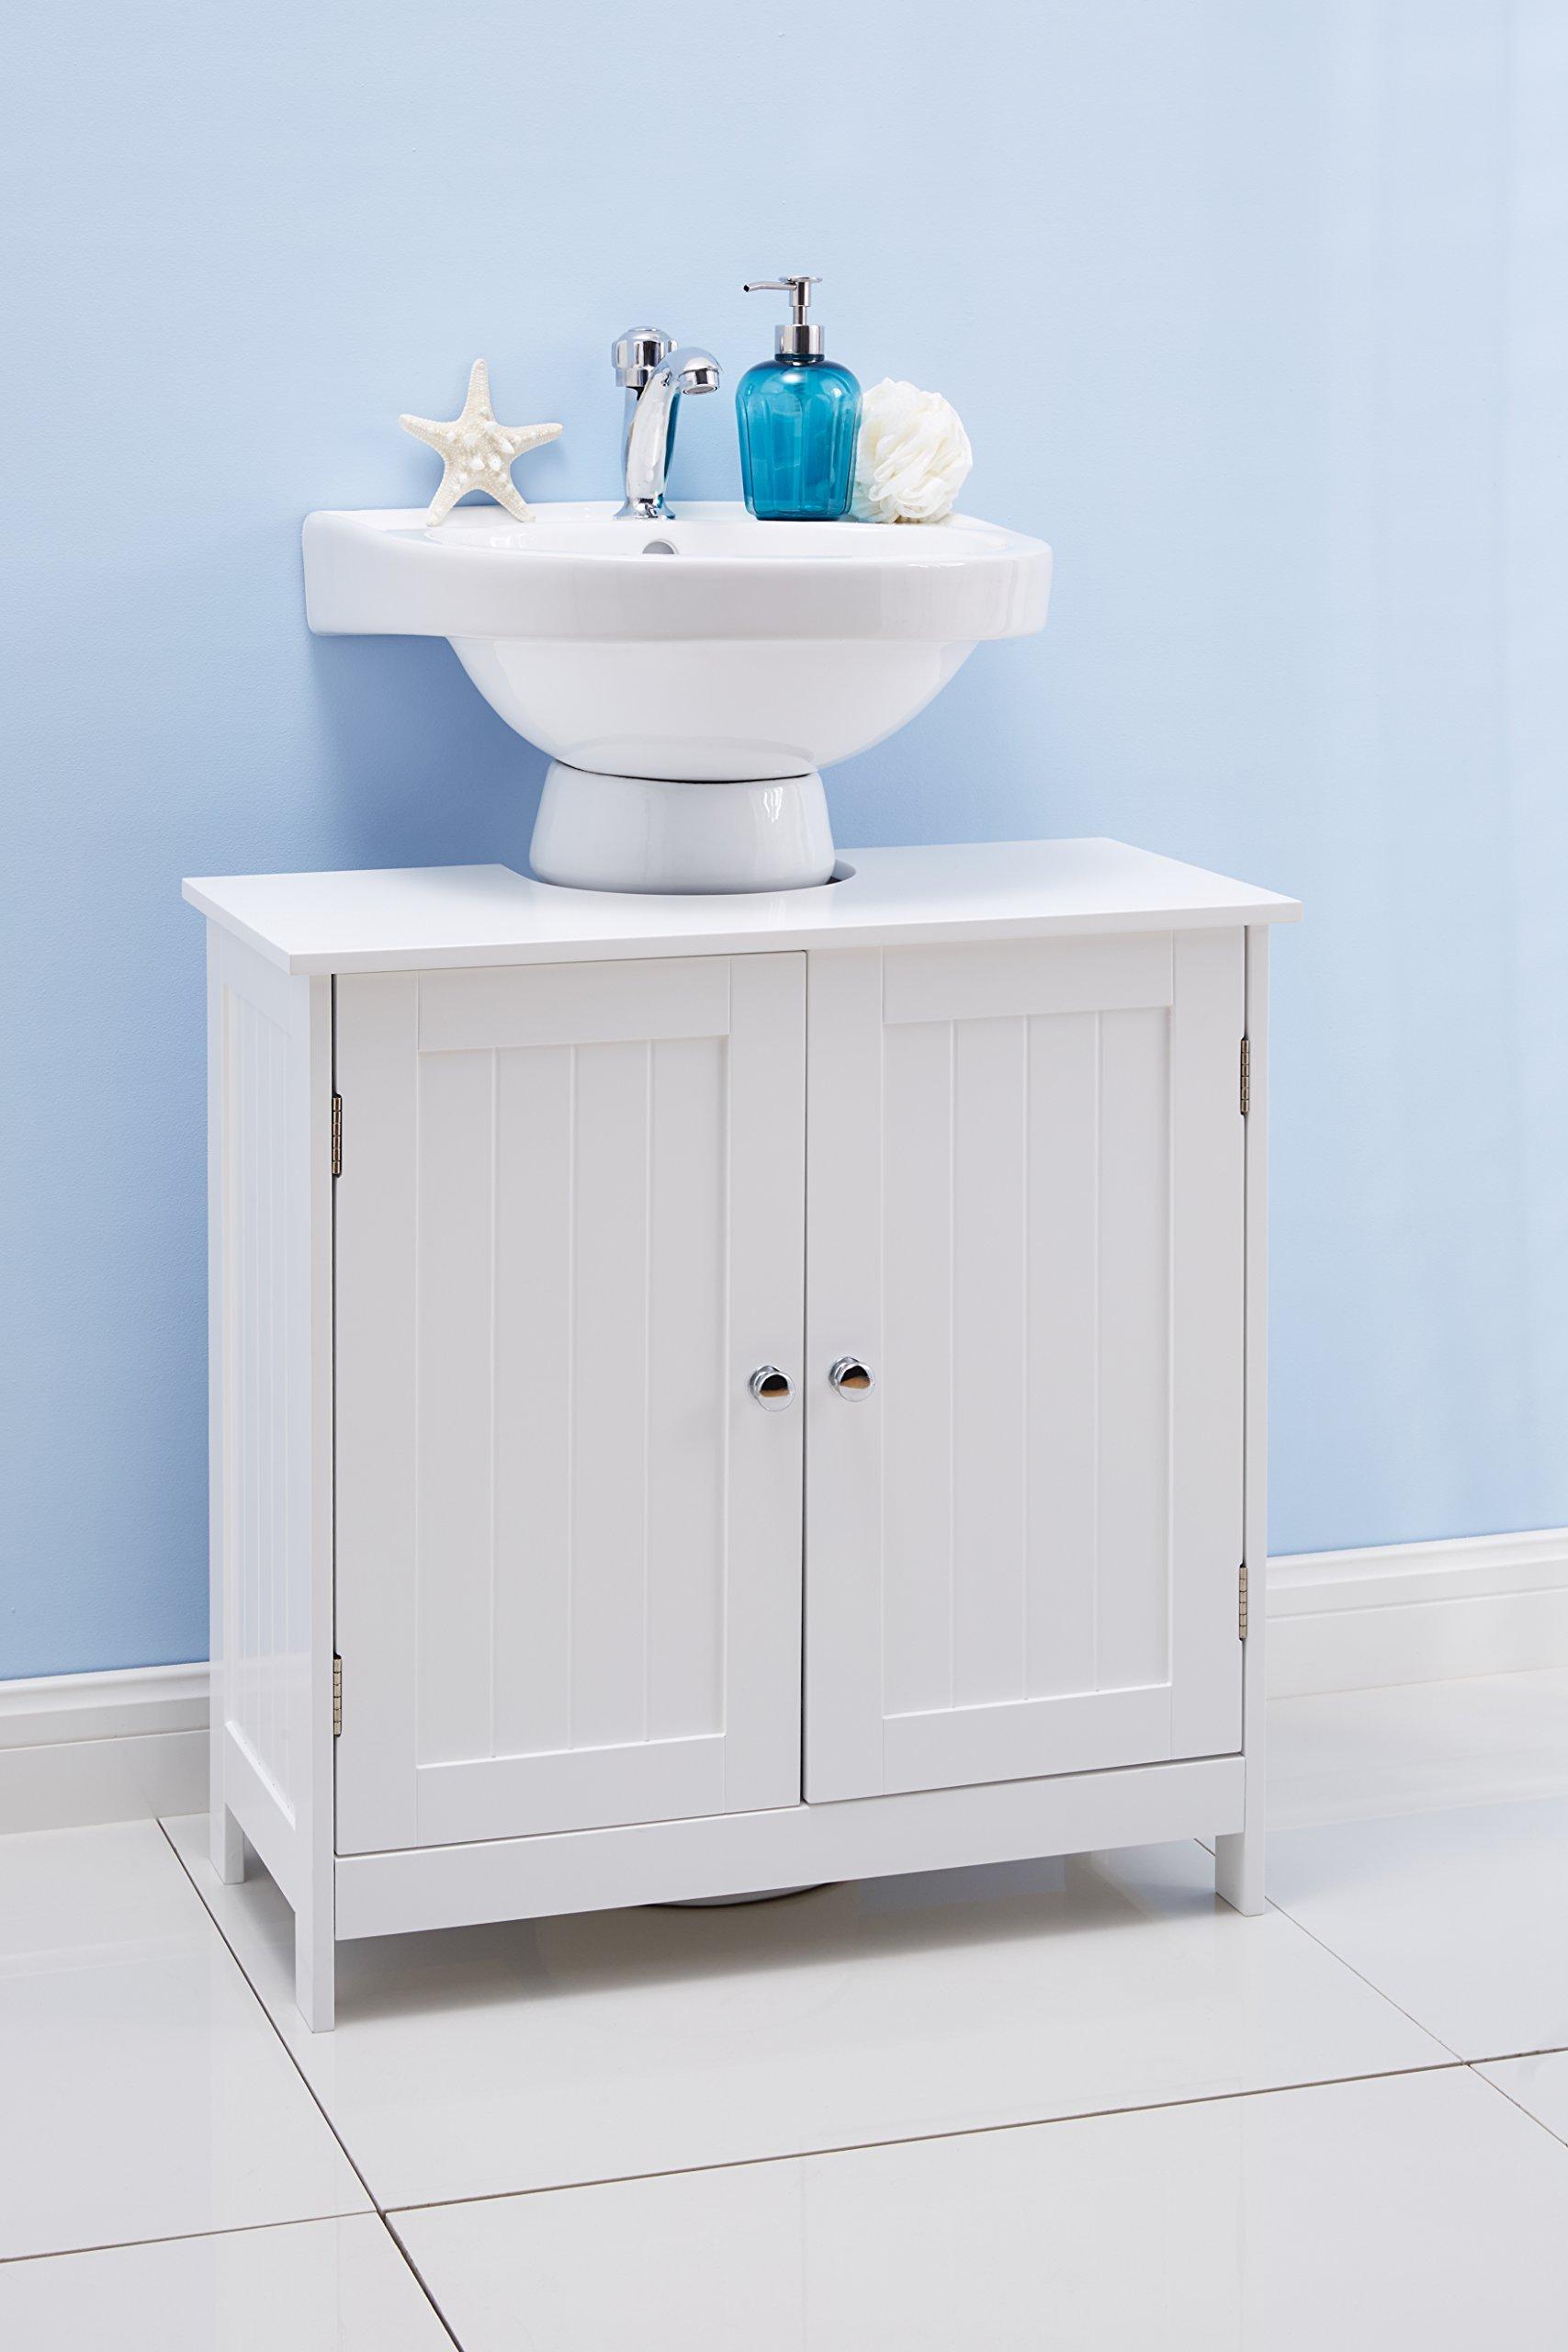 Portland Under Sink Bathroom Cabinet White - Buy Online in ...